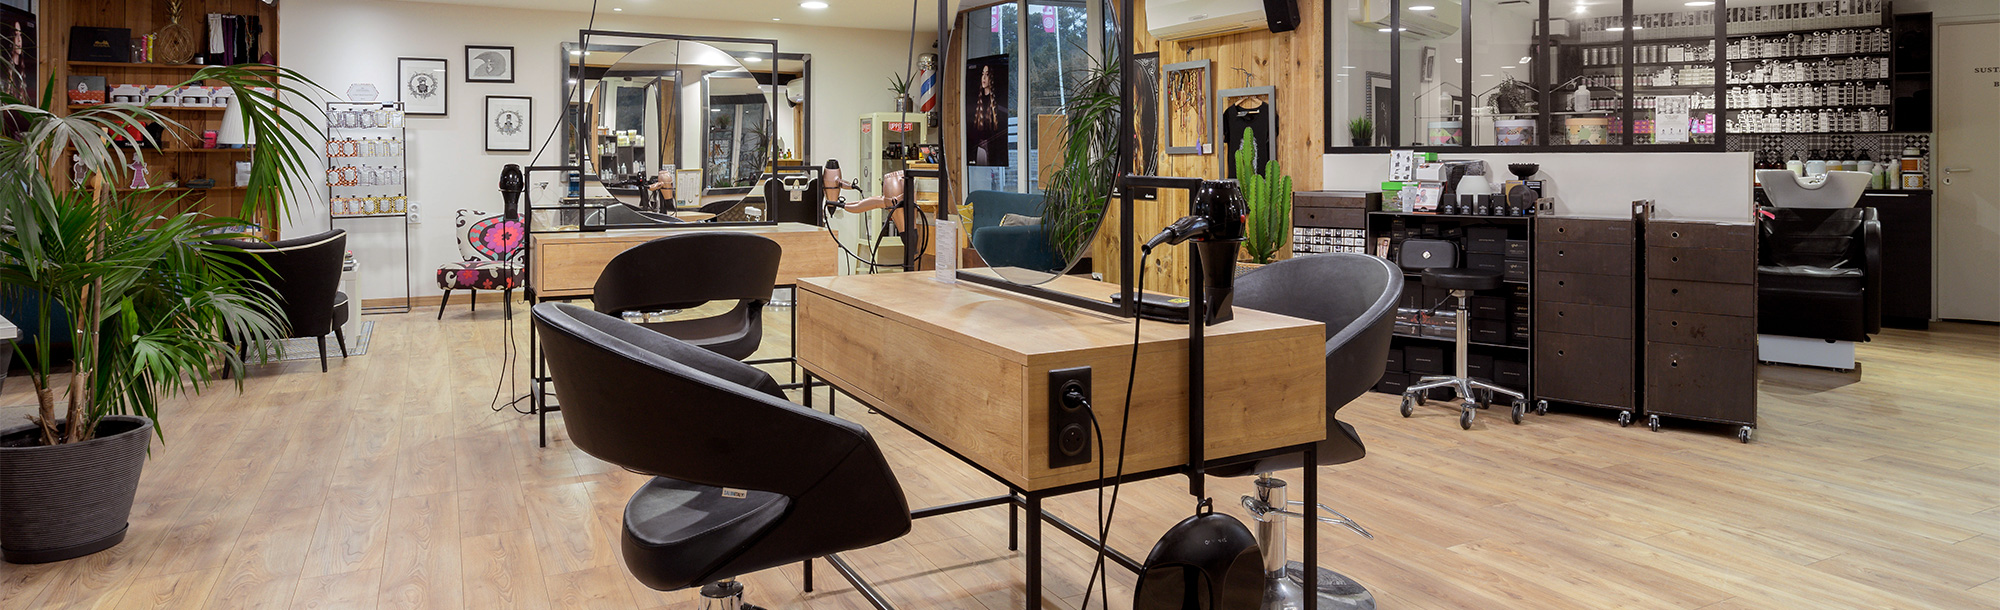 Le Vestibule Coiffure, Hossegor | Salon de coiffure, barbier, et ...